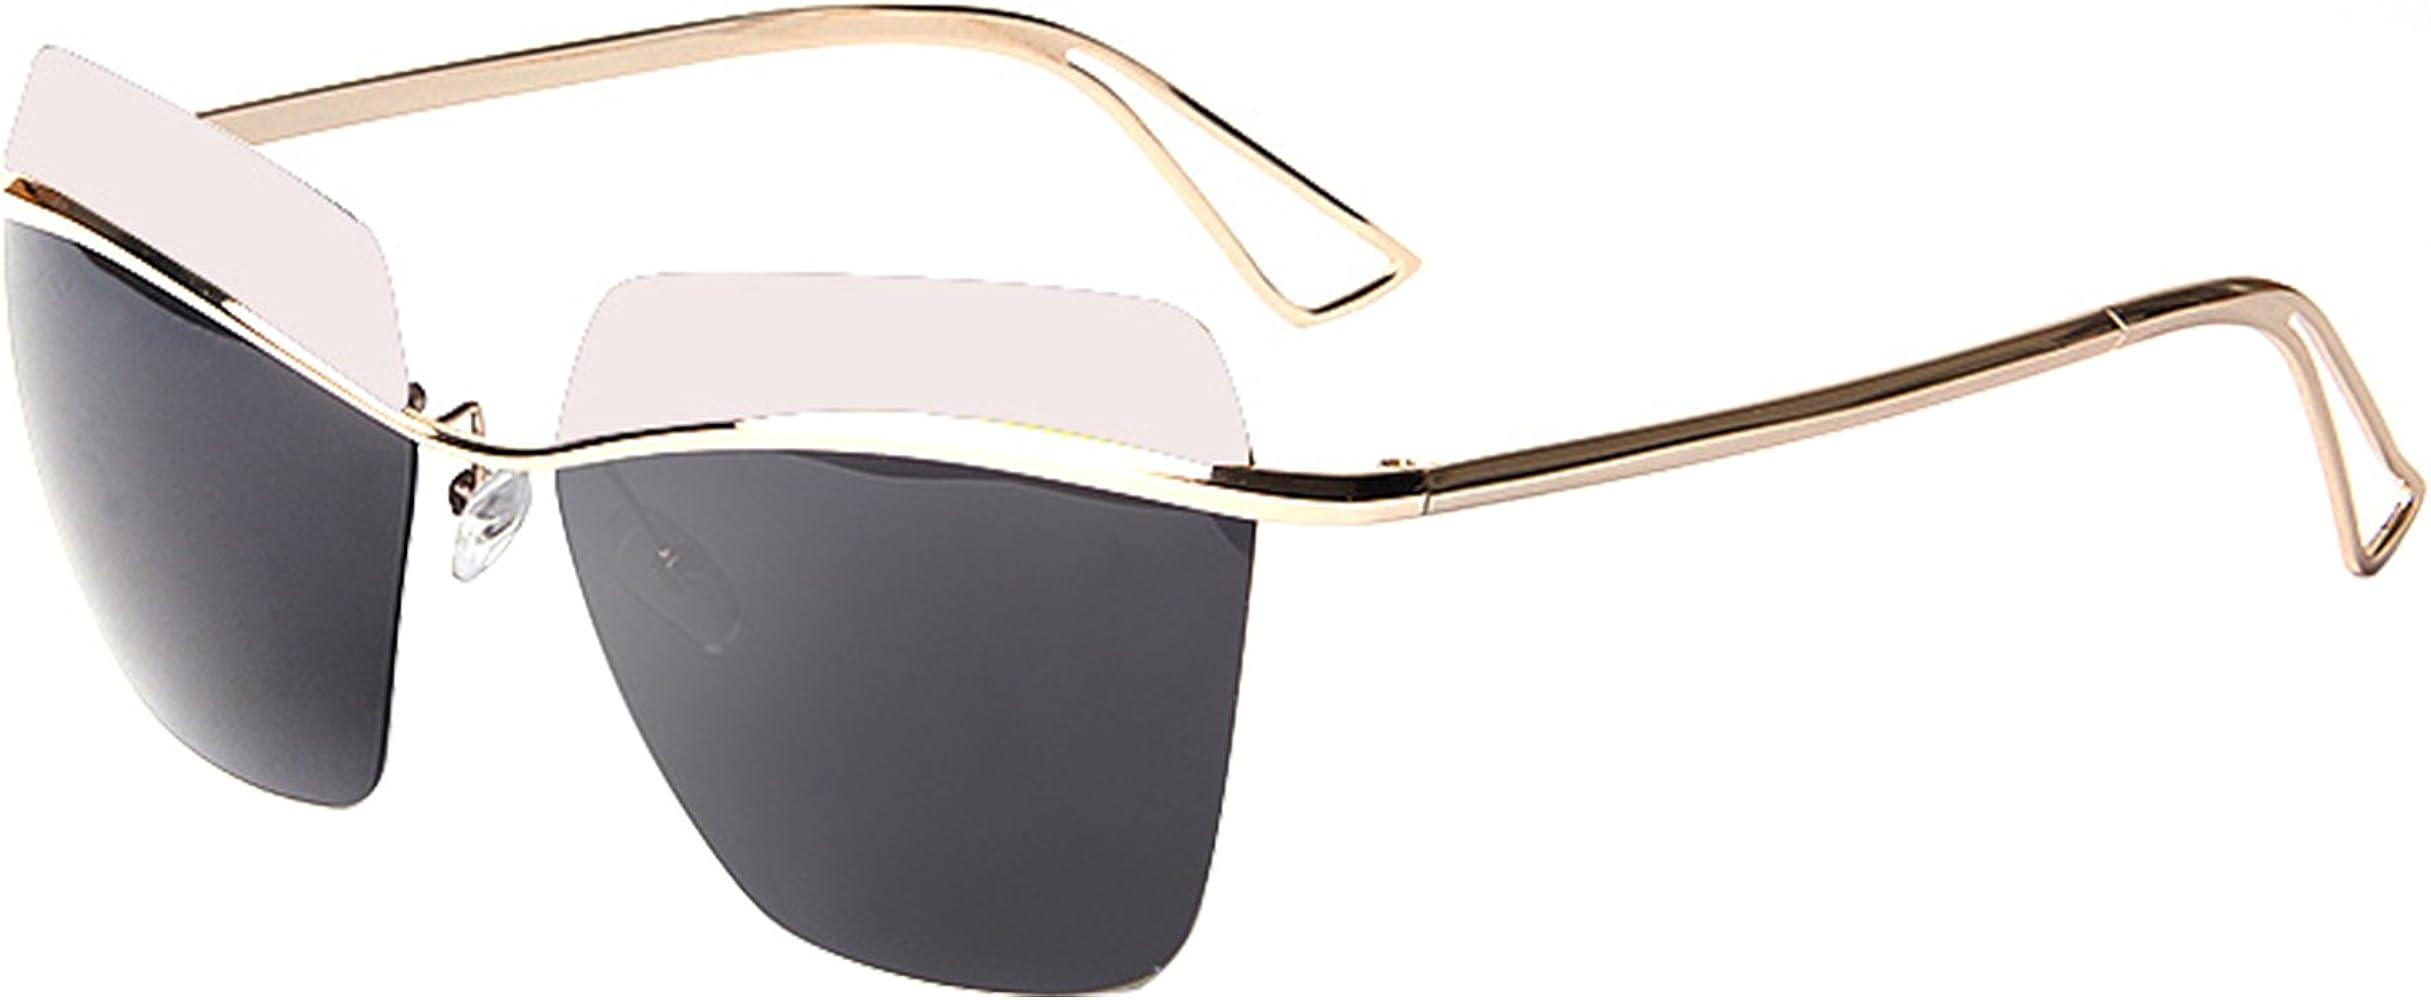 Double Bridge Metal Aviator Men Women Designer sunglasses with Pouch